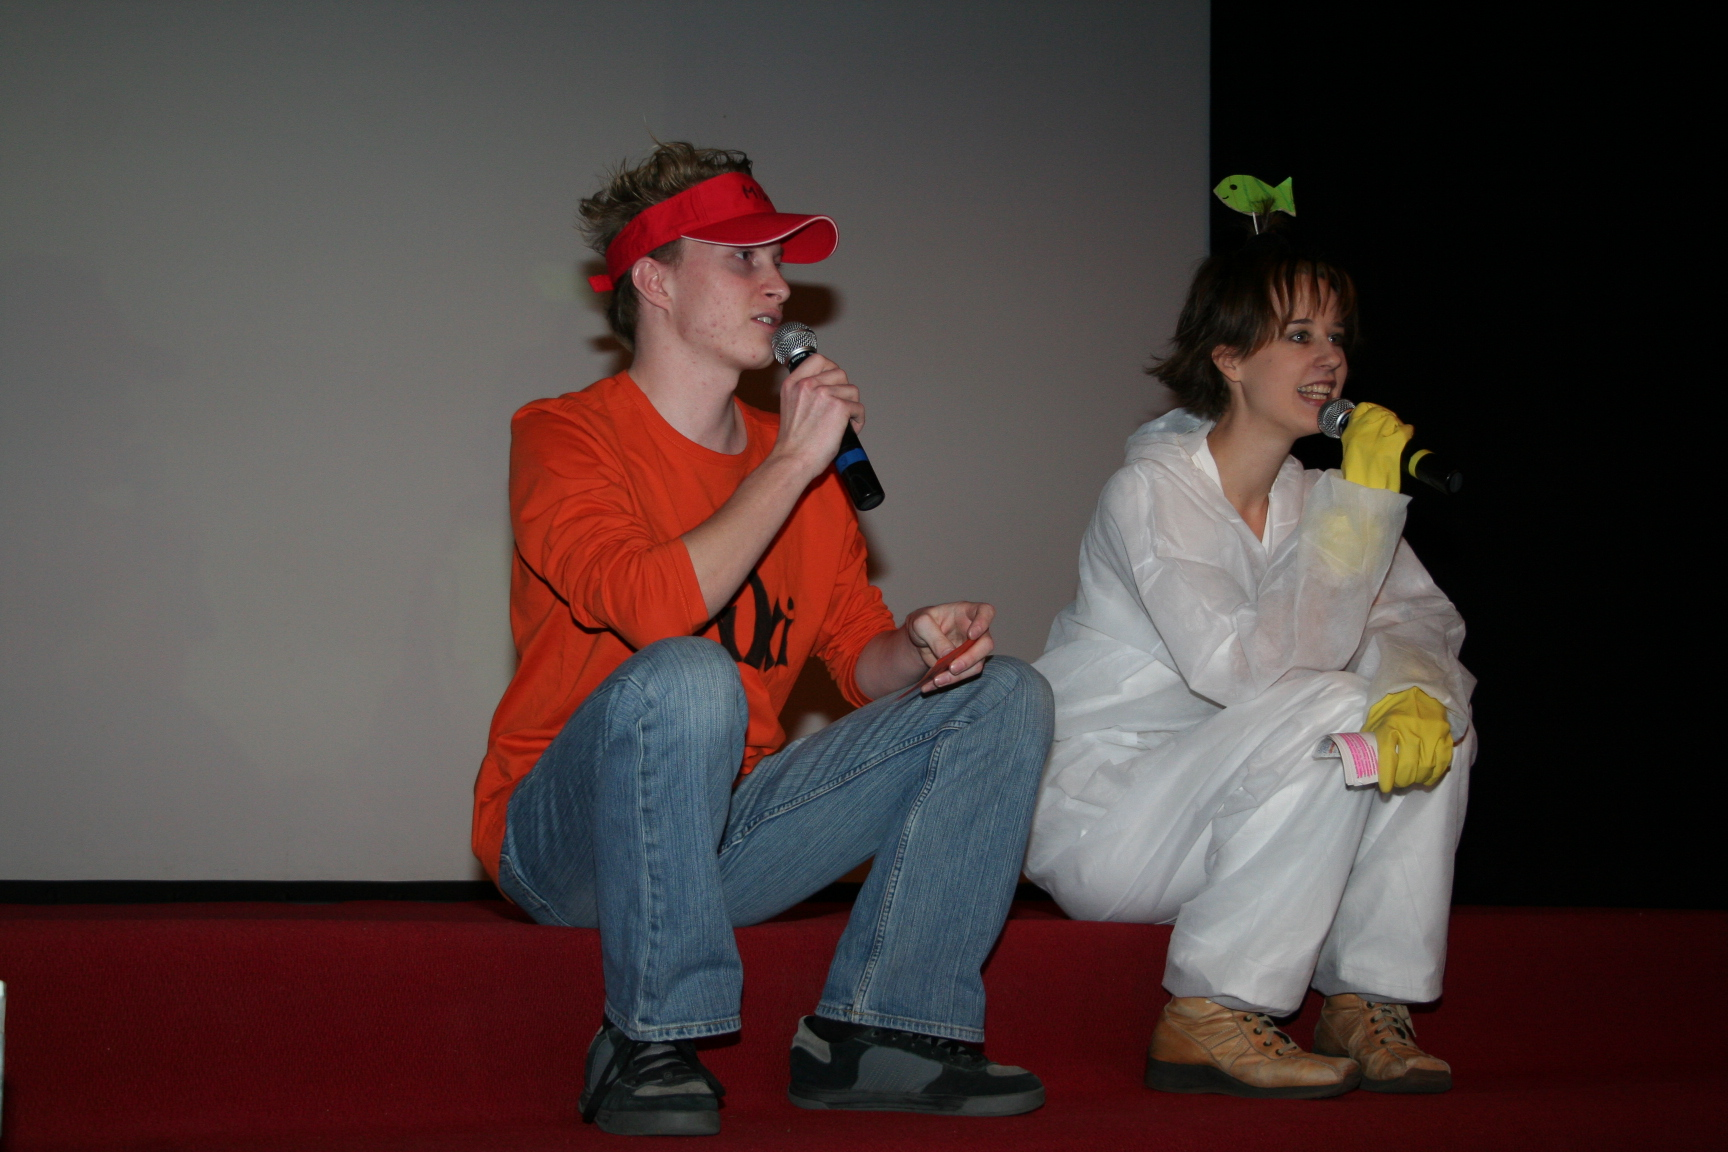 3. MiKiFiFe 2007: Impressionen (1)